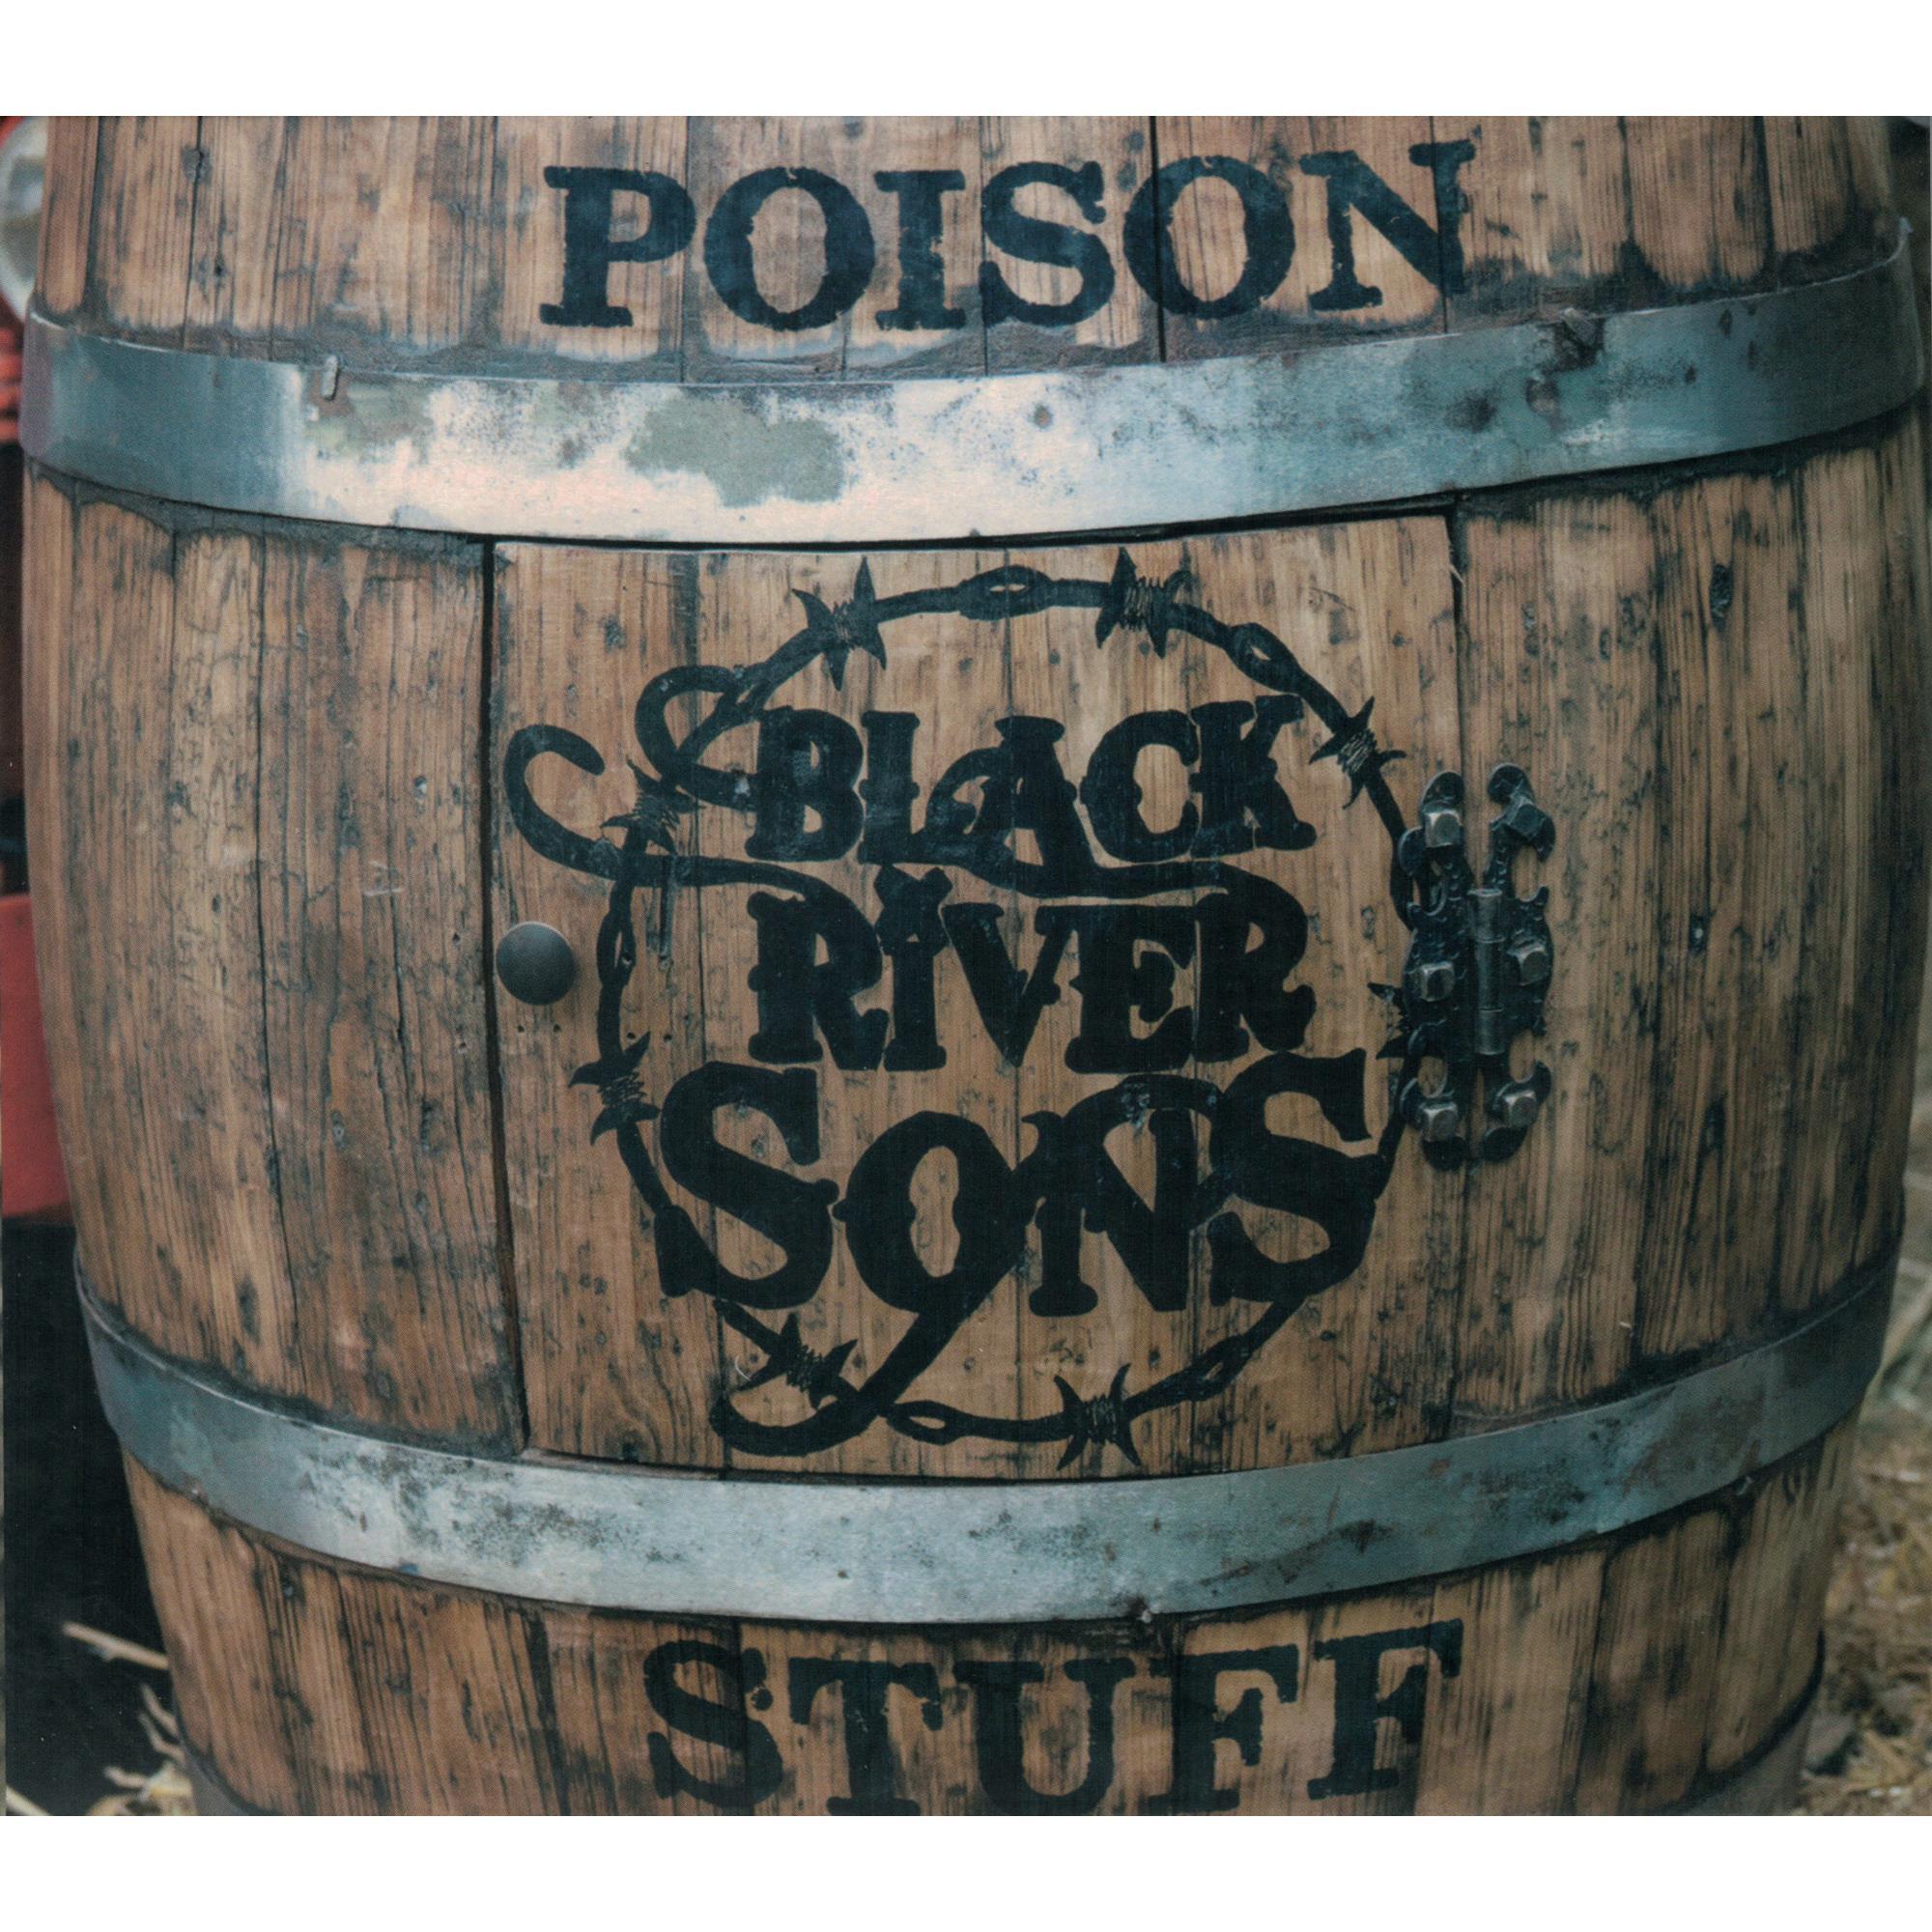 Poison Stuff CD